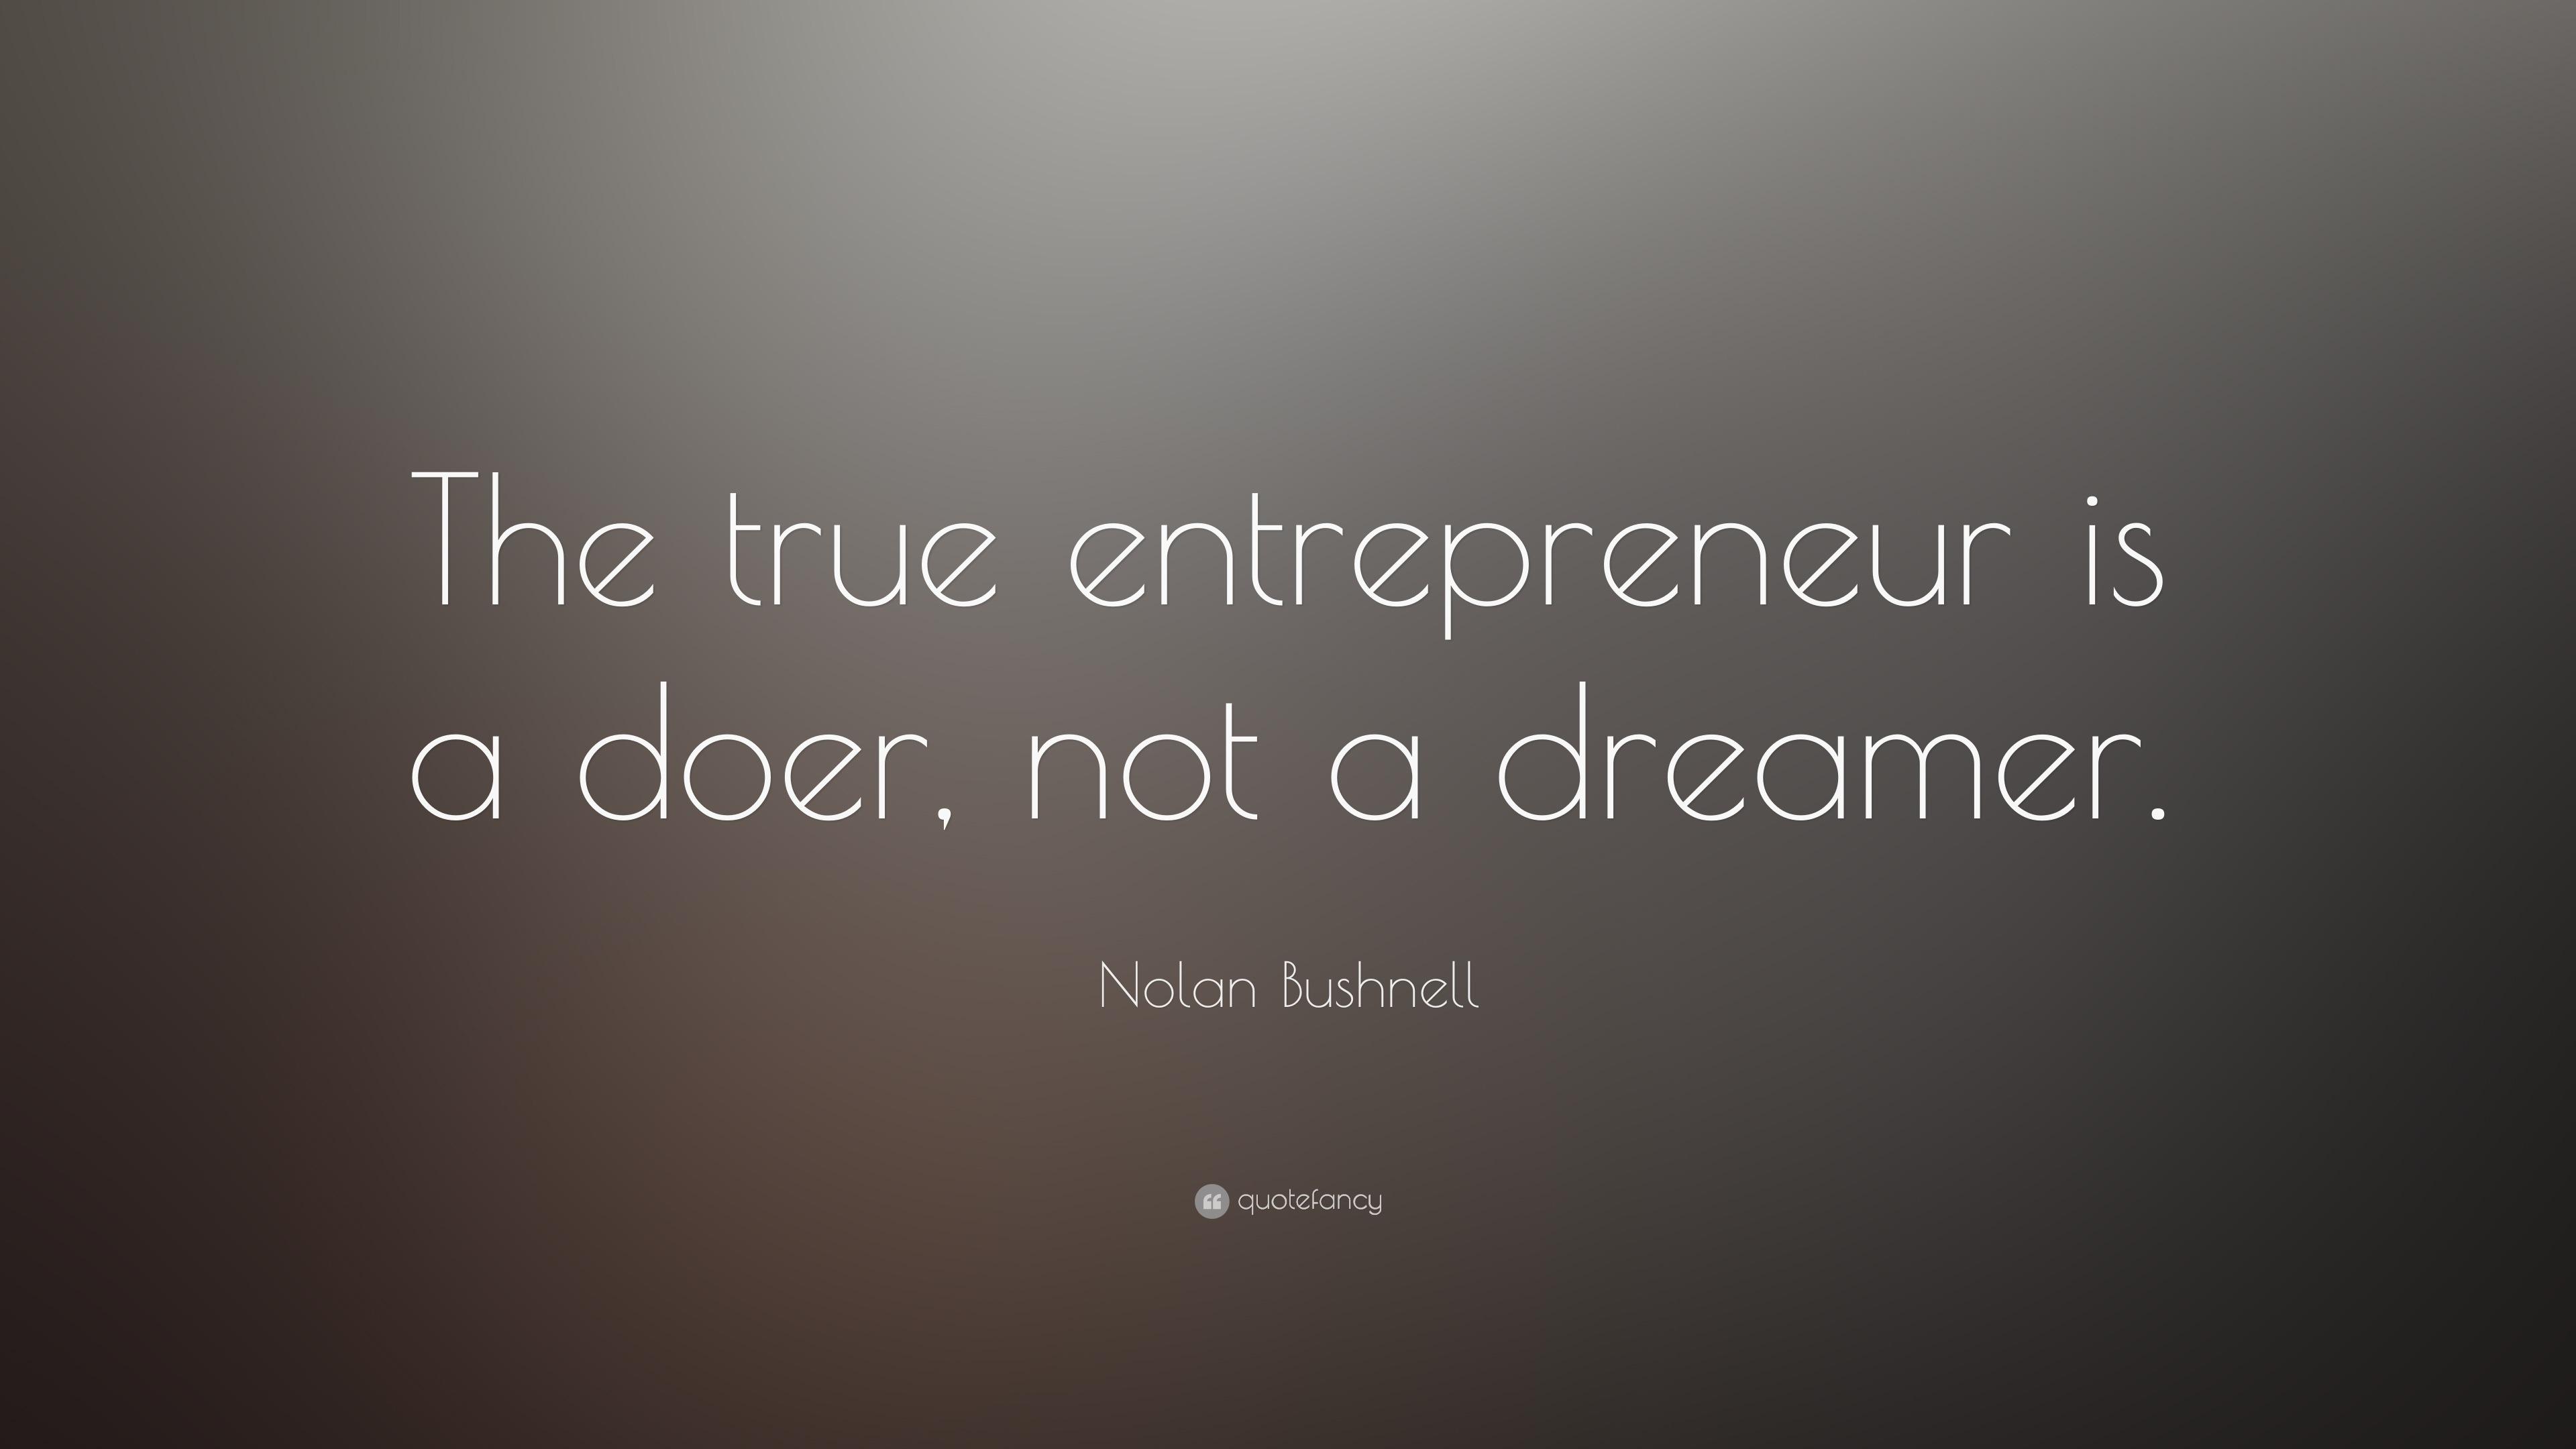 Nolan Bushnell The True Entrepreneur Is A Doer Not A Dreamer